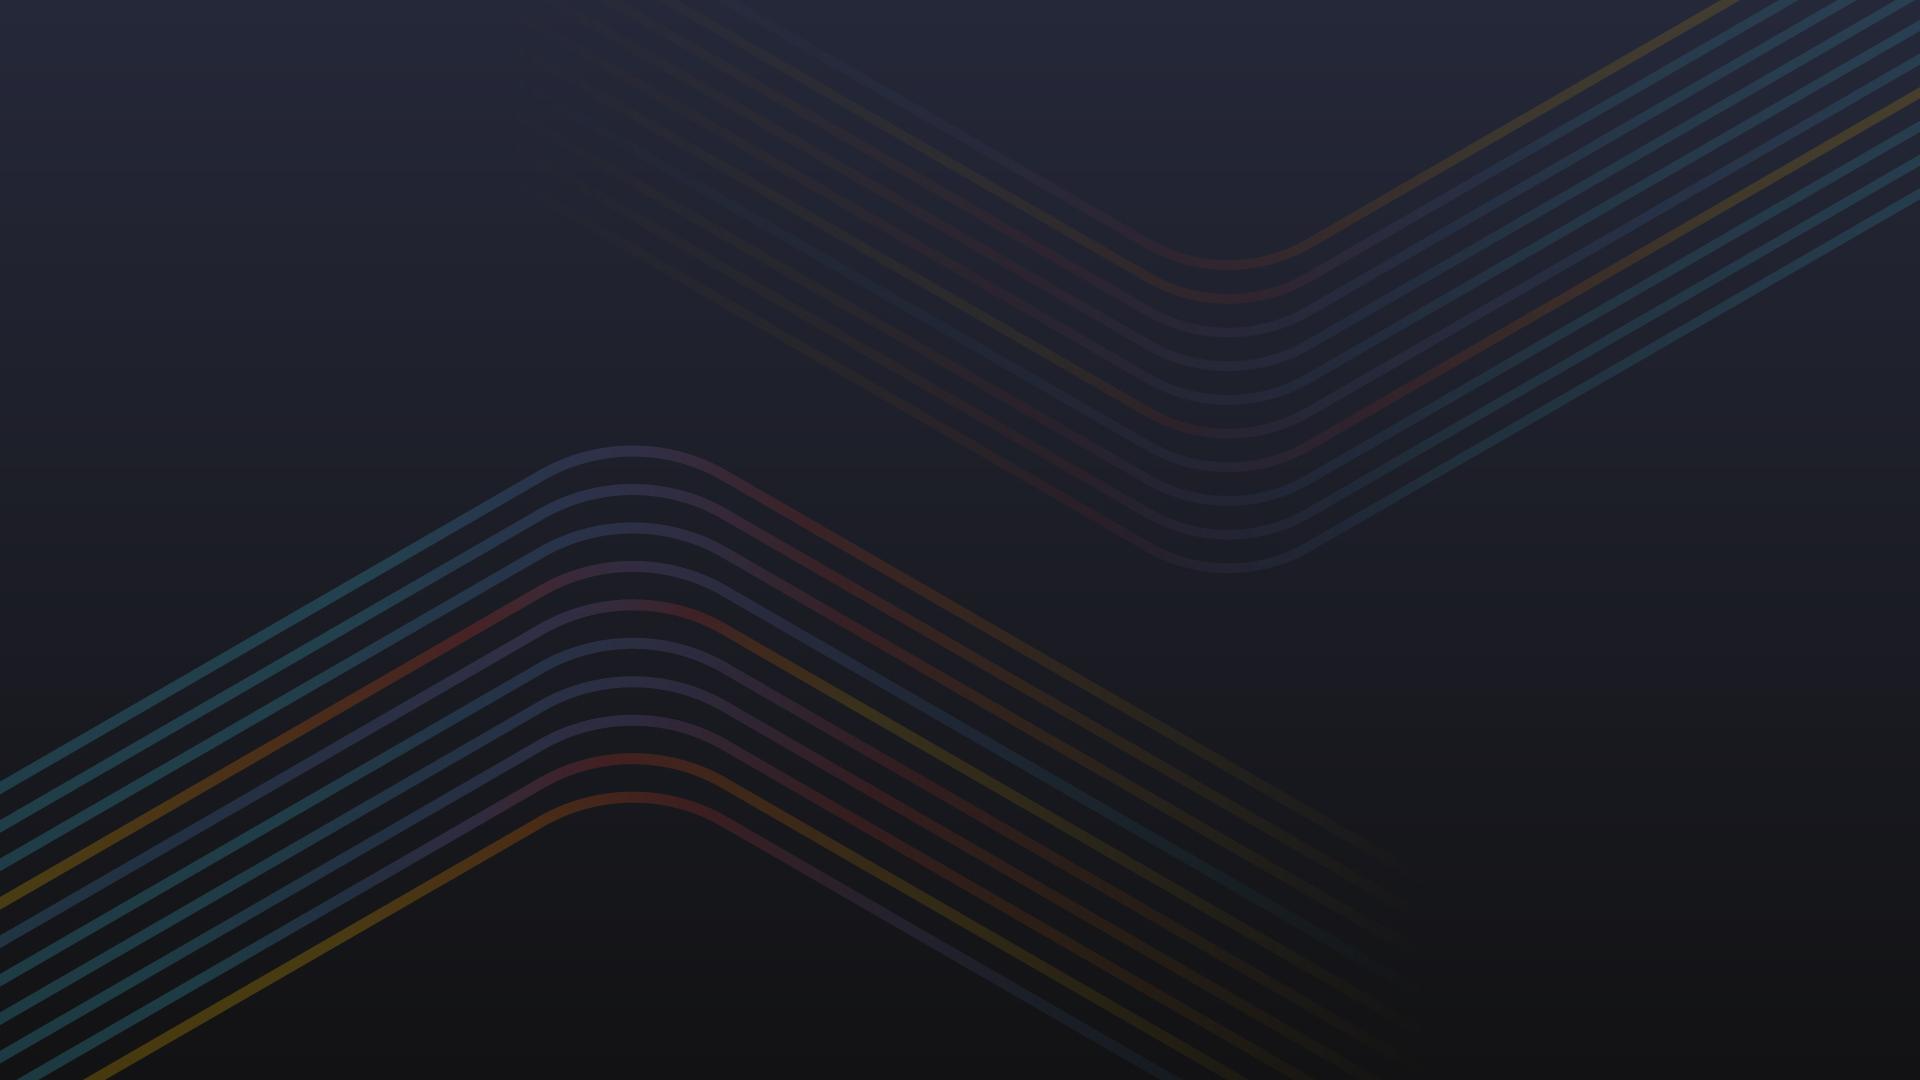 Branding נשבלערםומג crypto currency יצירת מותג מטבע קריפטוגרפי CrocodileBits